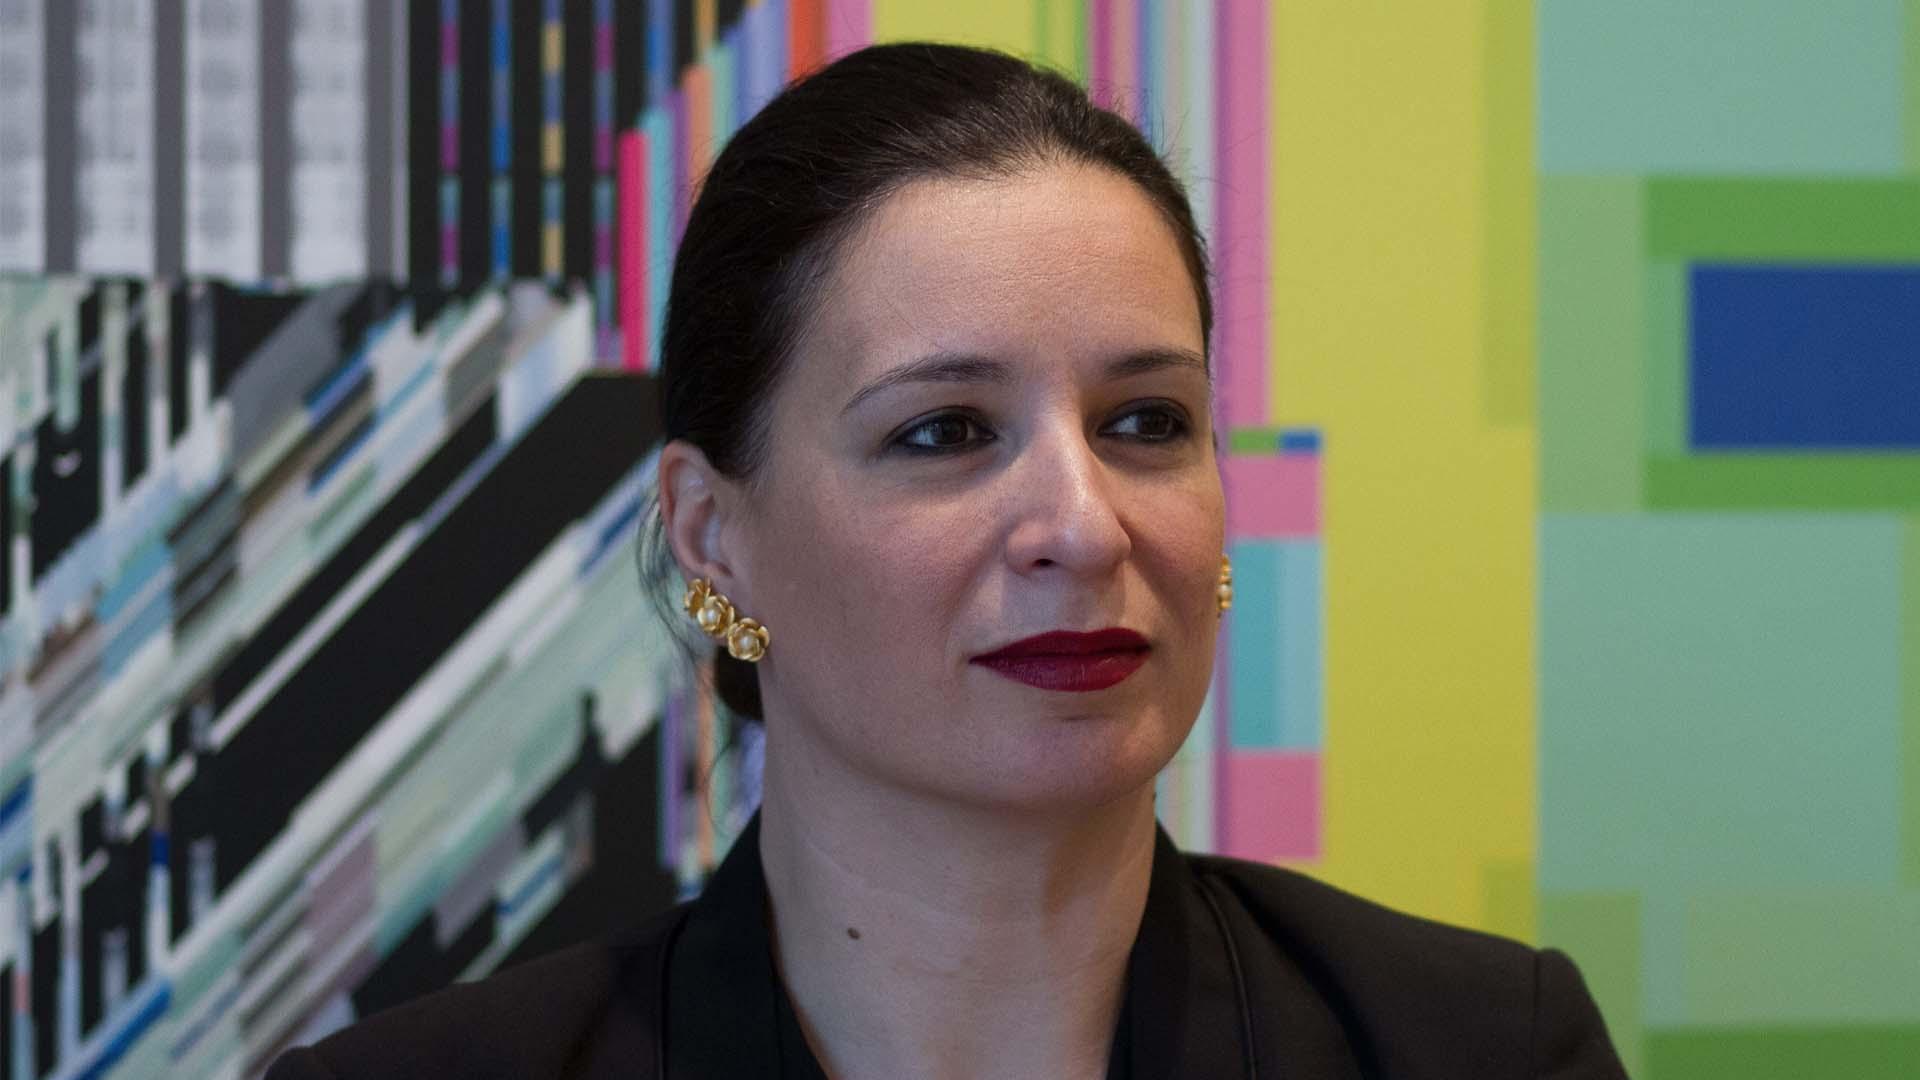 2017 lda mentor elena manferdini